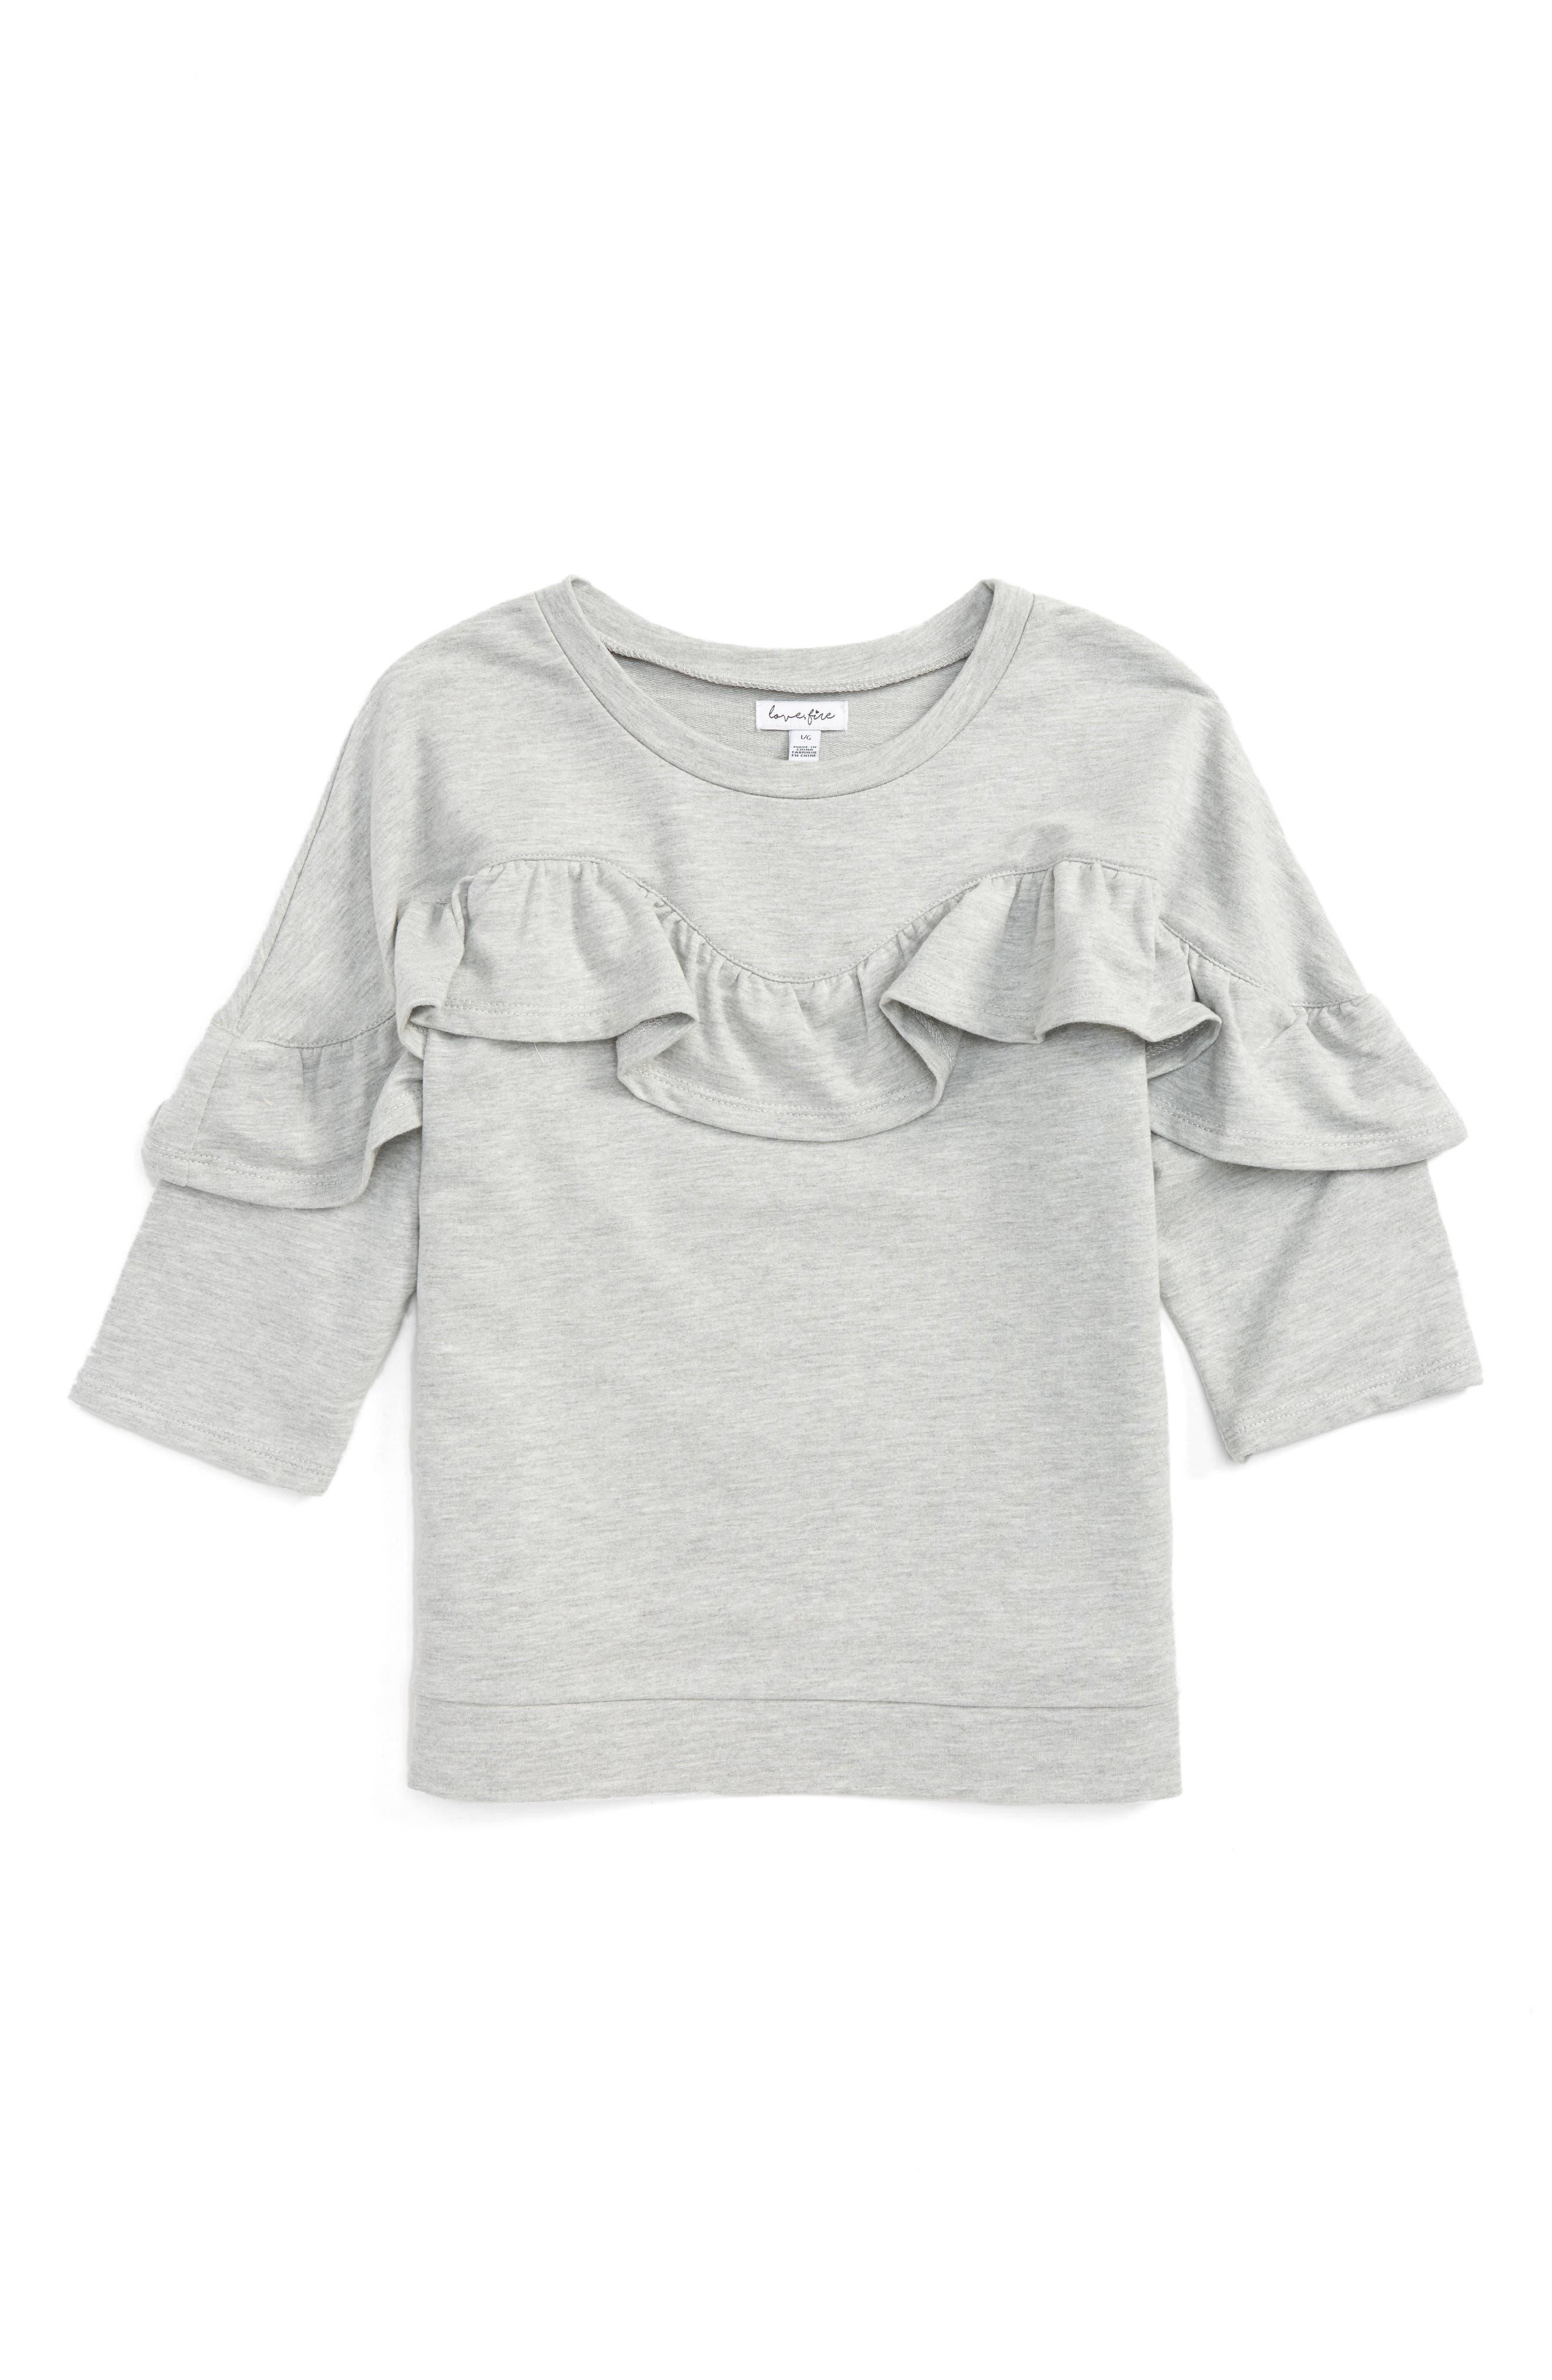 Ruffle Shirt,                         Main,                         color, 030